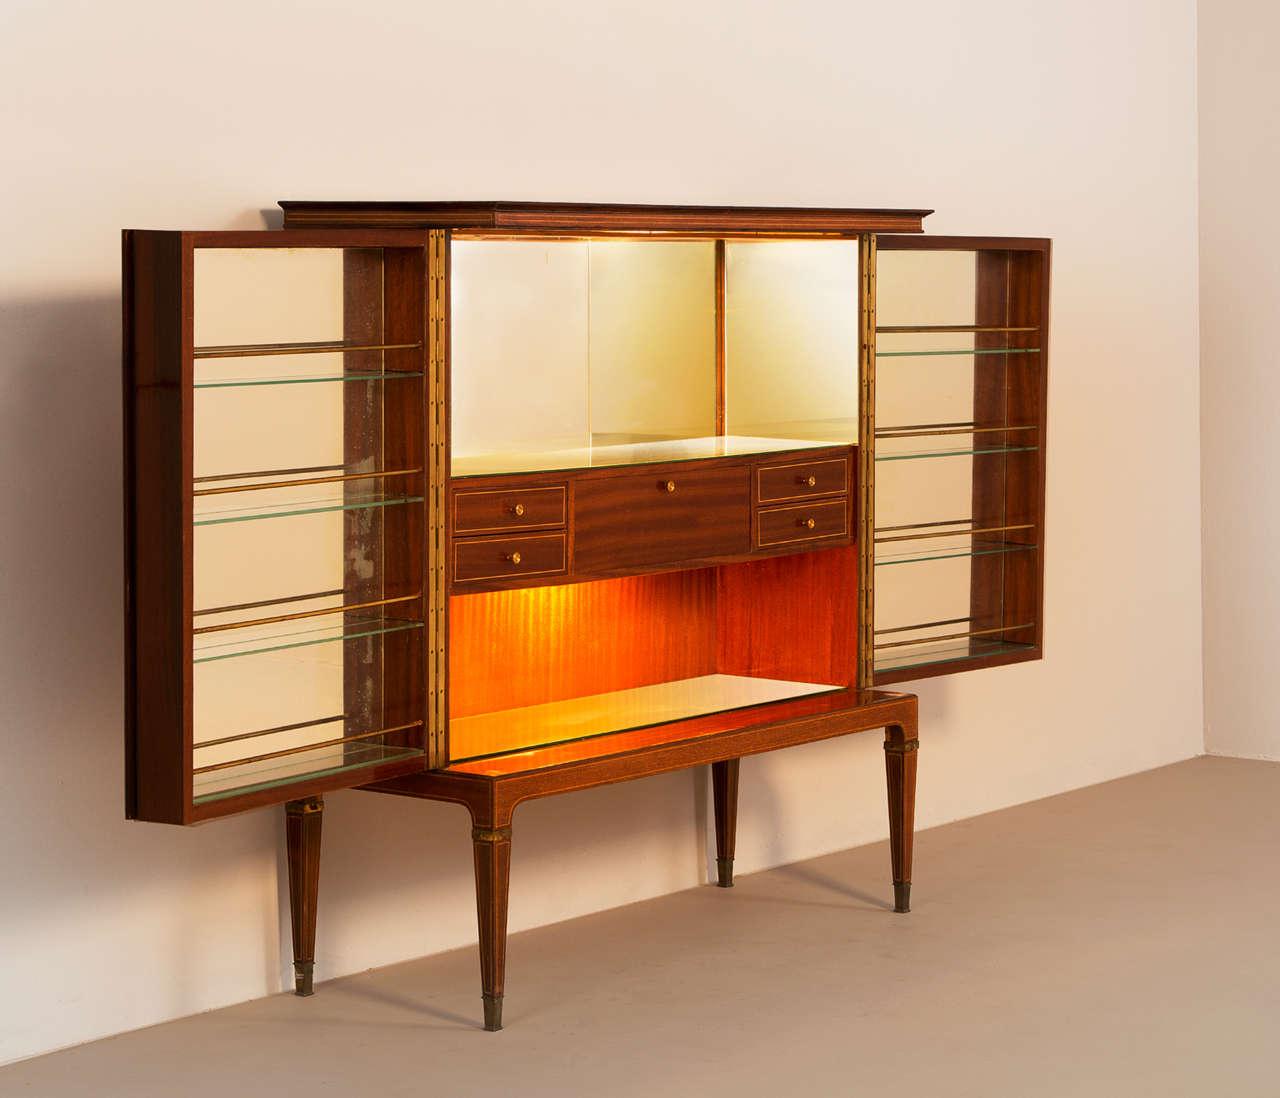 Paulo Buffa Large Liquor Cabinet For Sale At 1stdibs